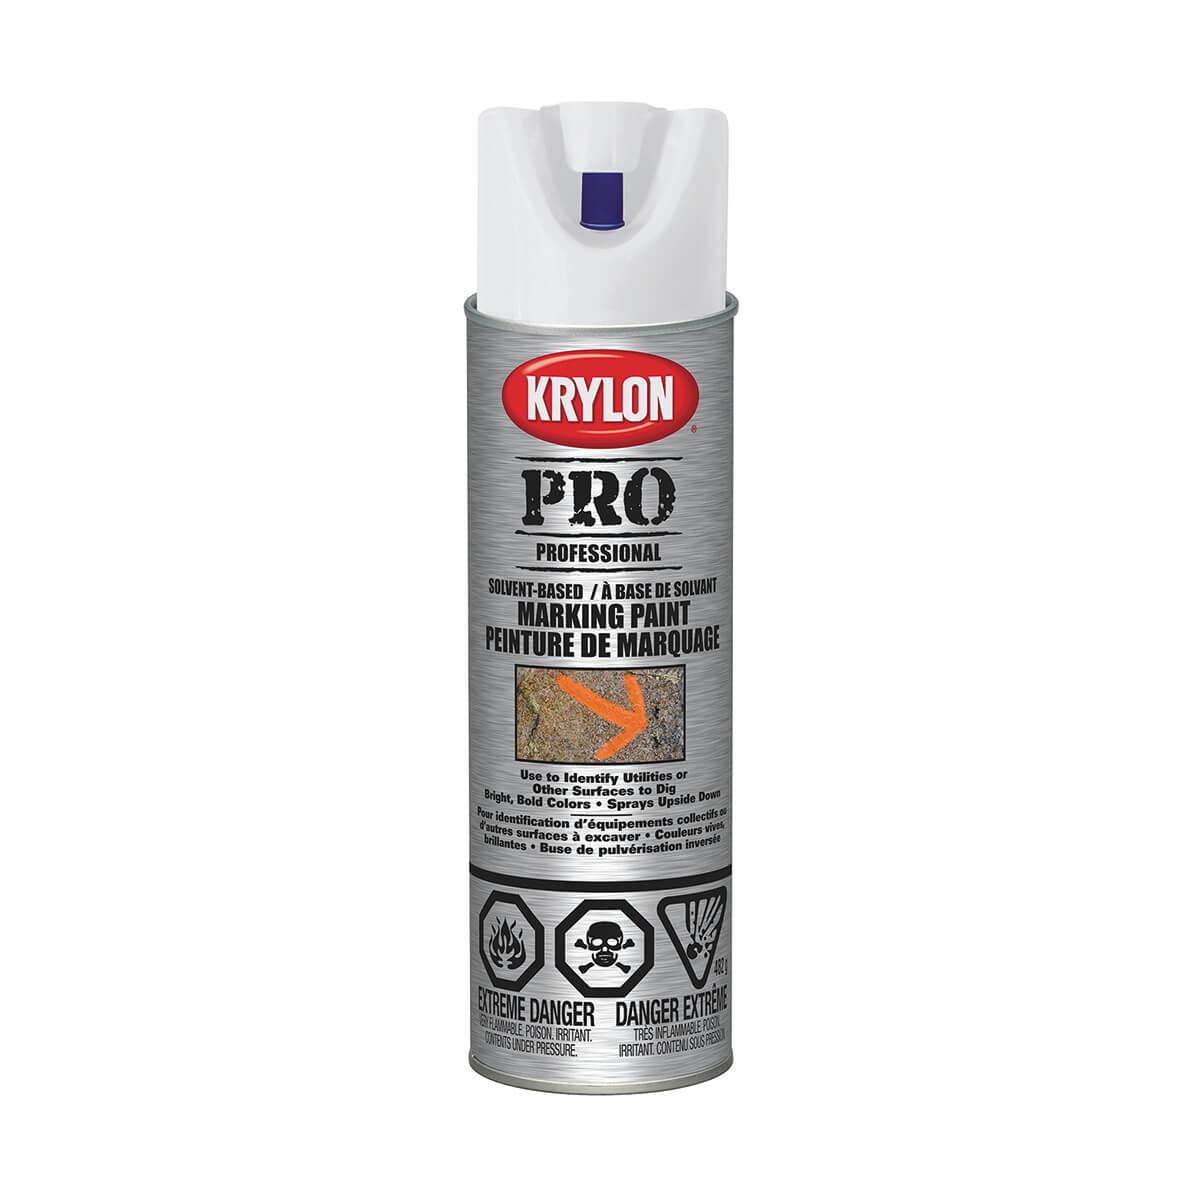 Krylon contractor marking paint, Solvent based, APWA White - 482 g